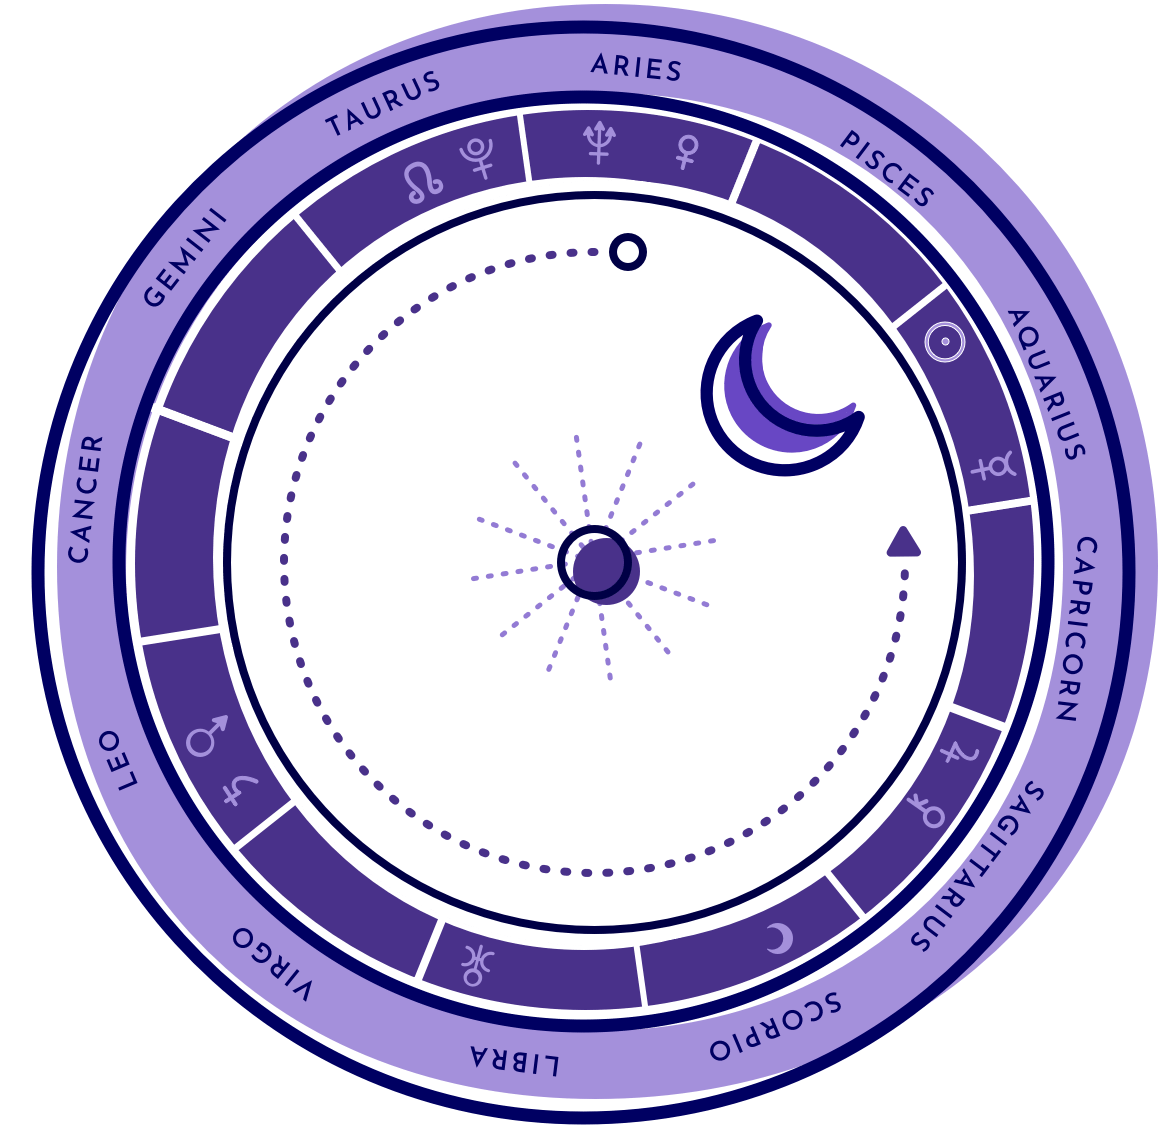 astro-chart-img